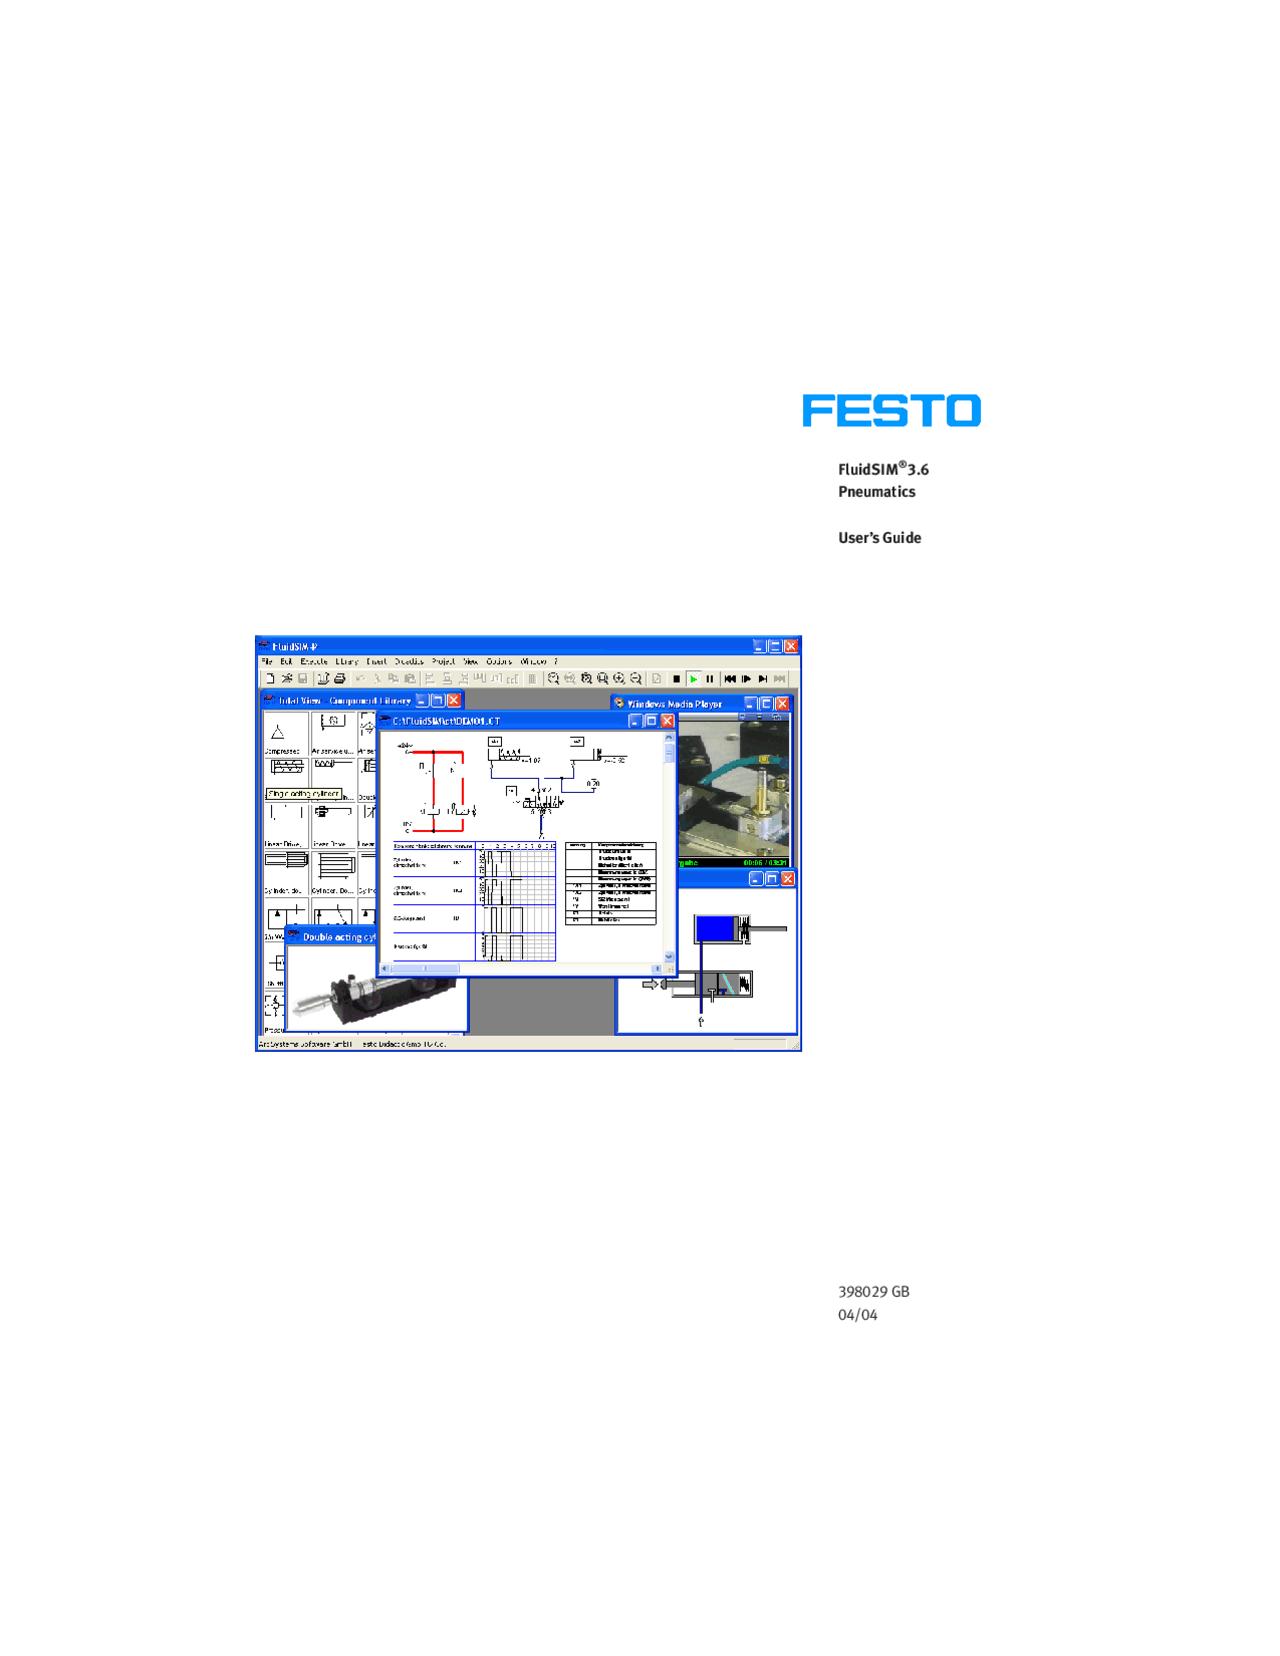 5 code fluidsim activation Fluidsim 4.5